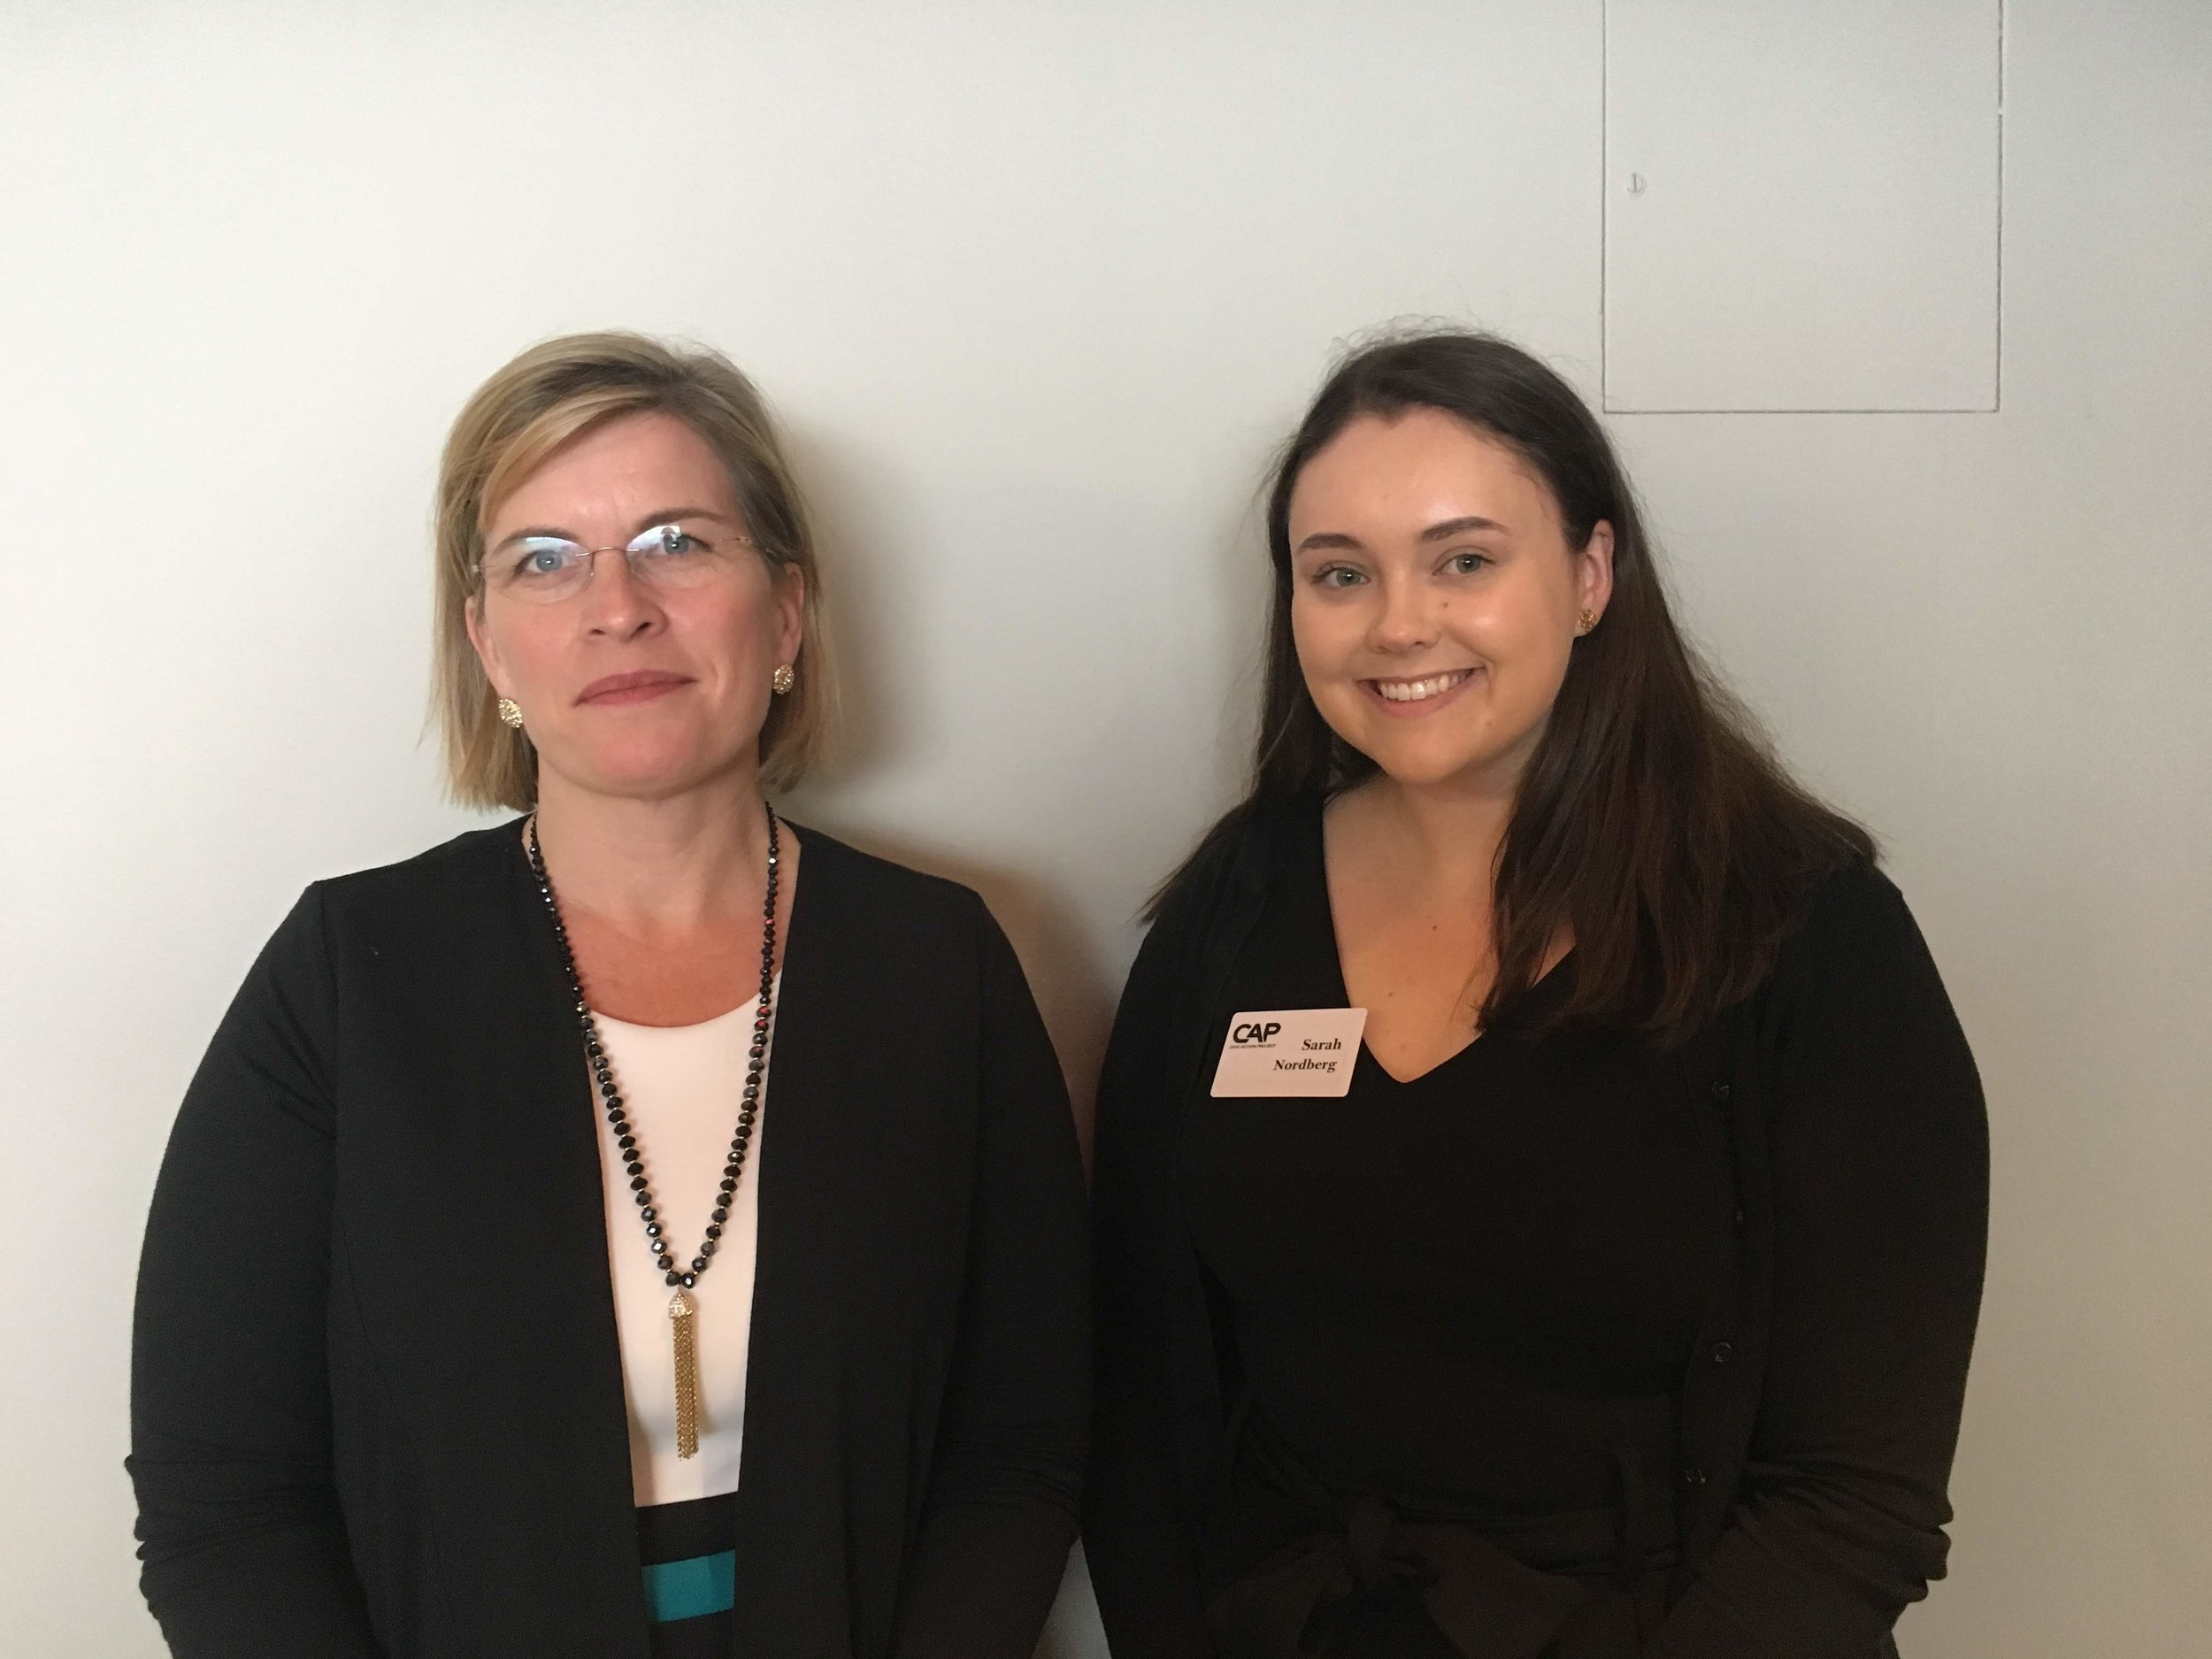 Faculty Presenter and Host Supervisor, Representative Marjorie Decker and CAP Fellow Sarah Nordberg on June 12.